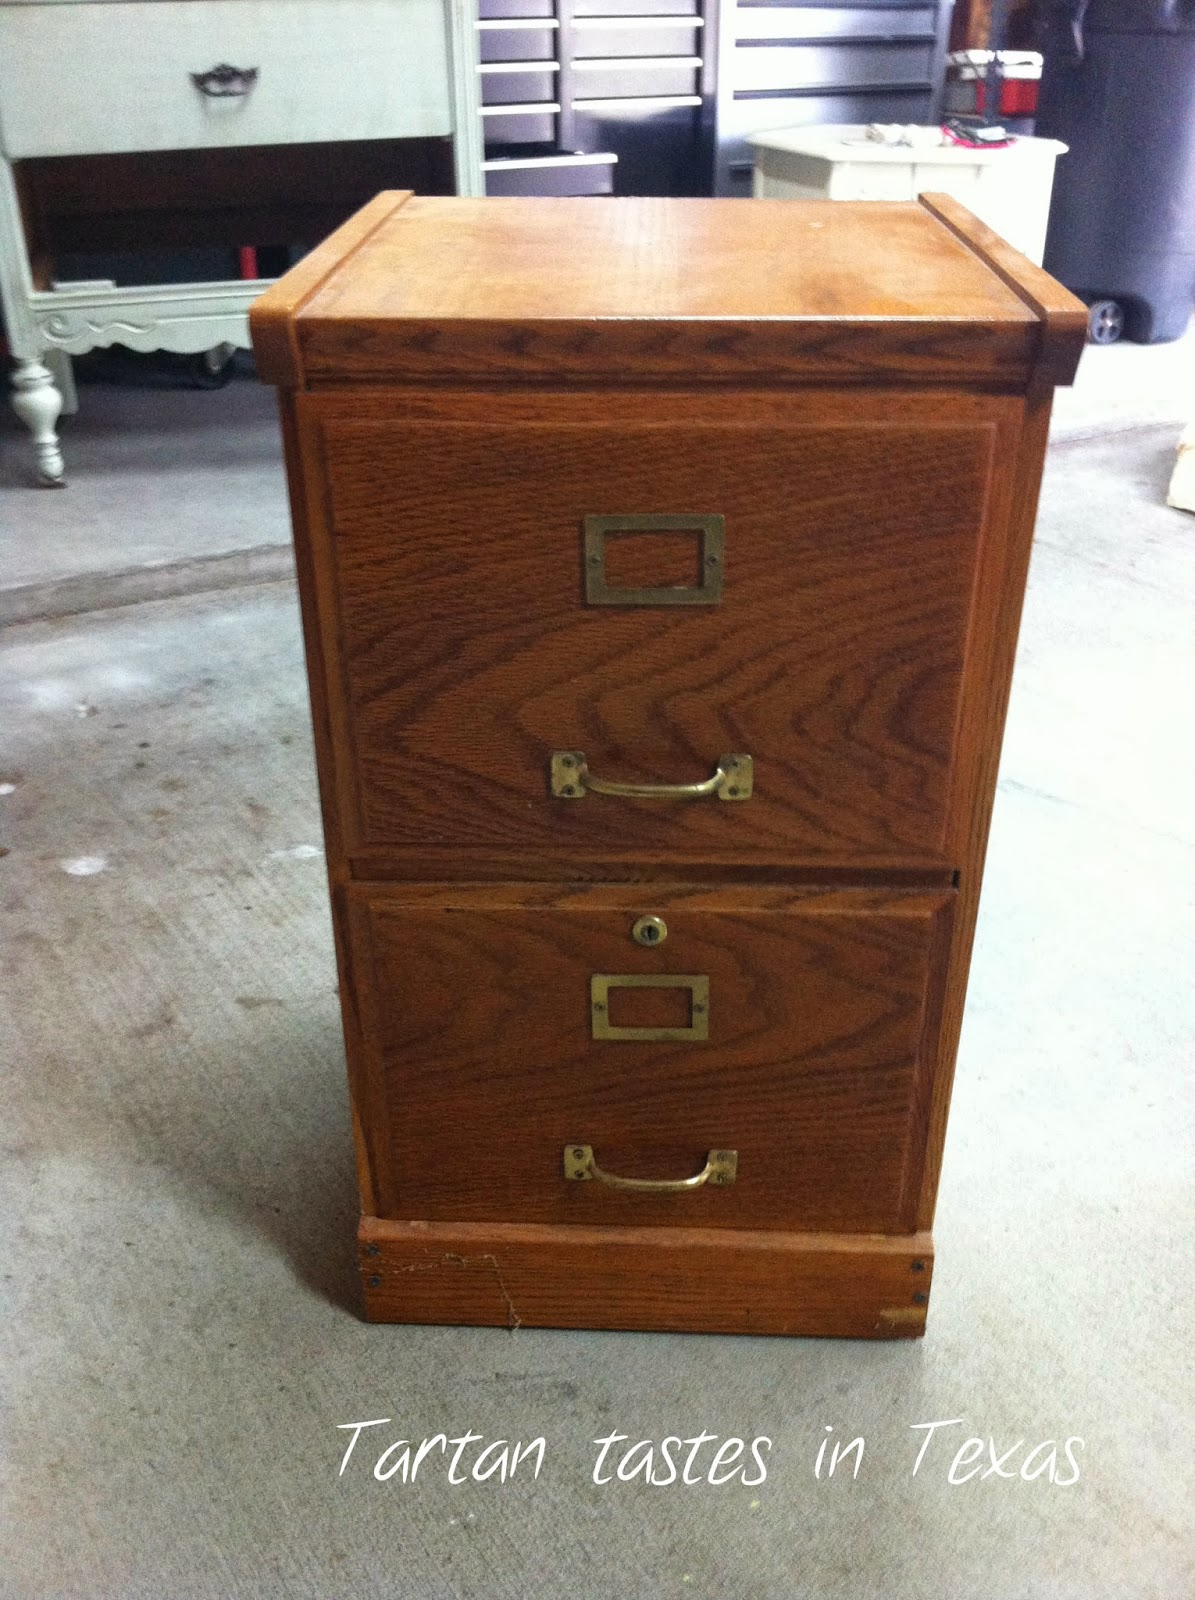 Tartan Tastes in Texas: Furniture Friday - File Cabinet Redo